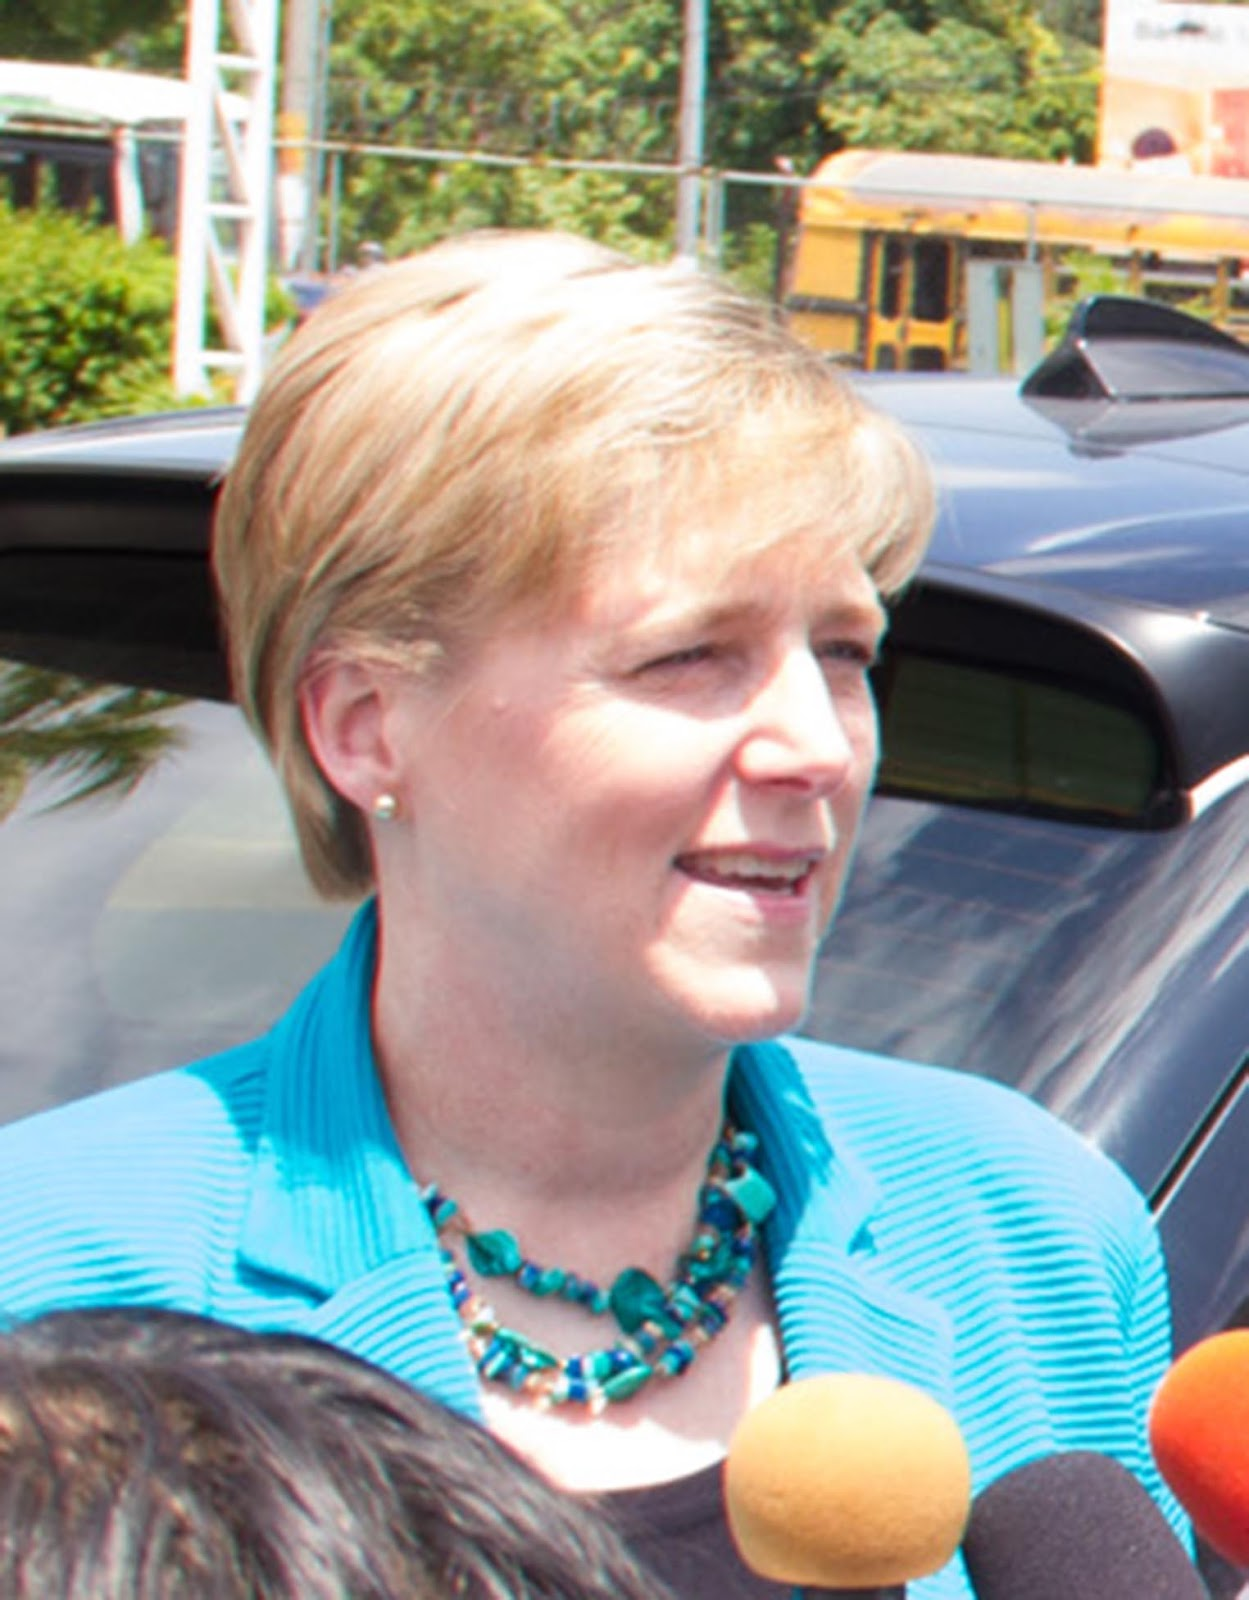 La Embajada de Estados Unidos anuncia la llegada de la Embajadora Laura F.  Dogu a Nicaragua